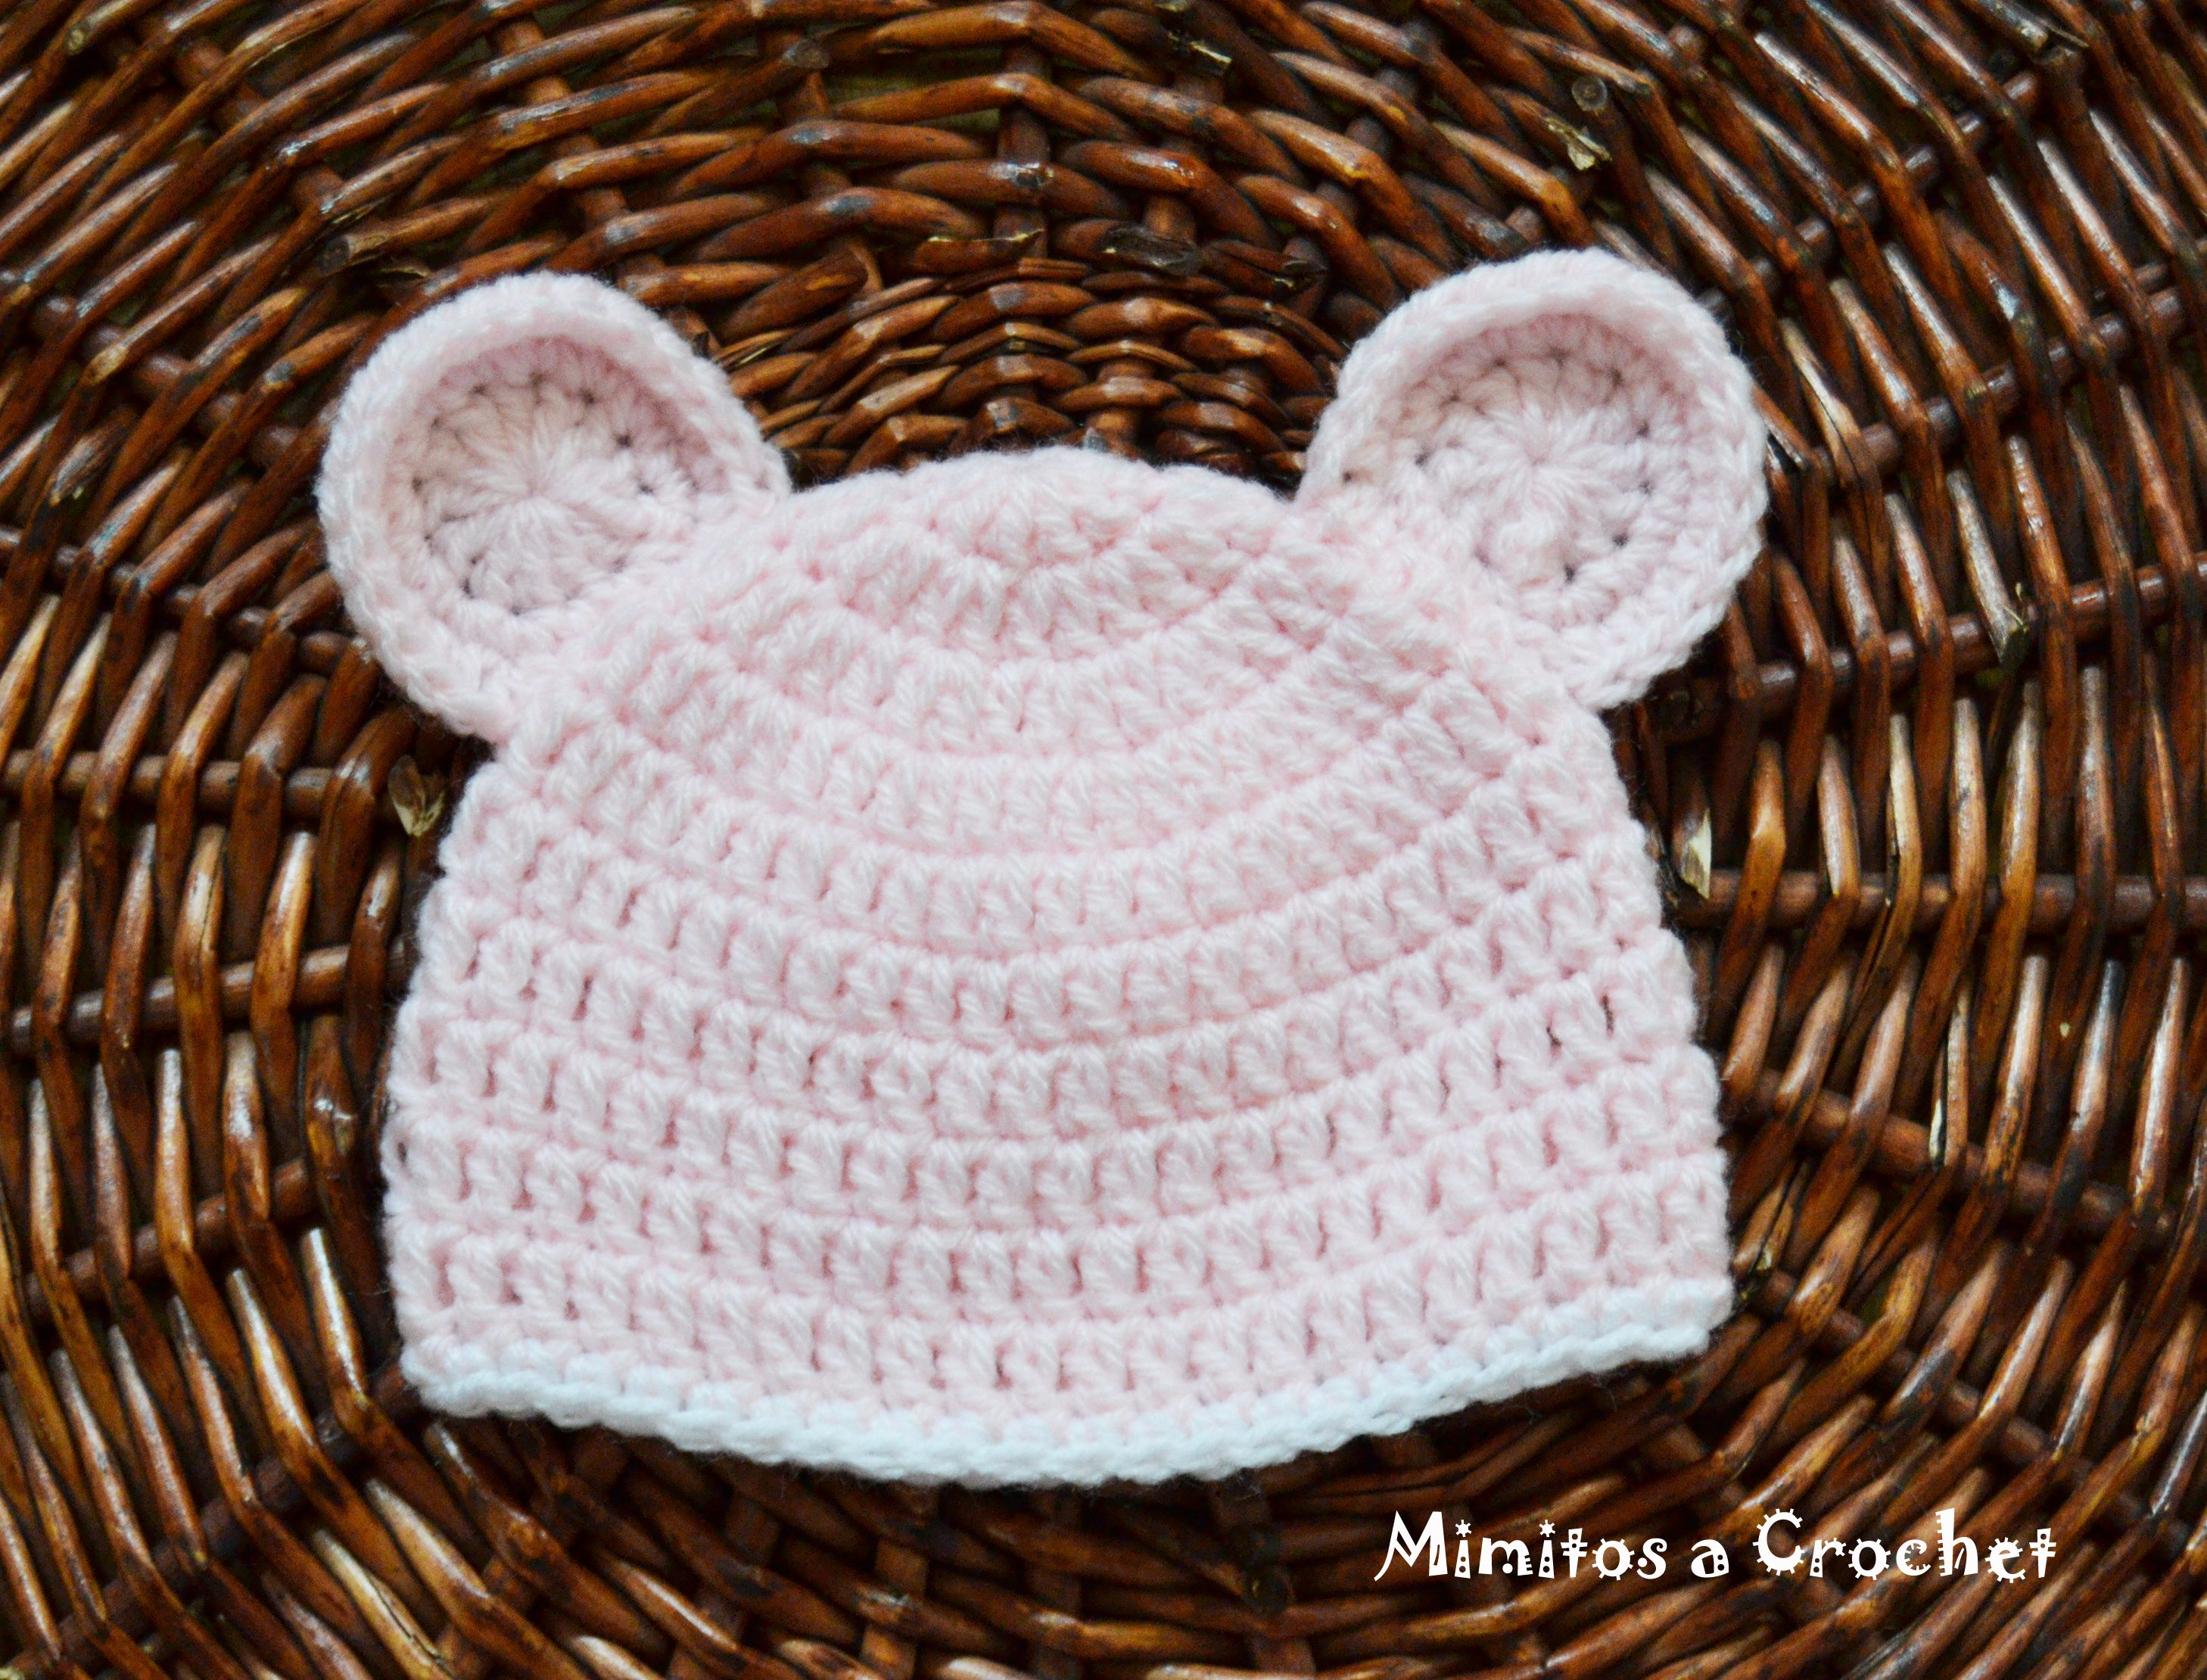 Gorro de Minion a Crochet | Mimitos a Crochet | crochet | Pinterest ...